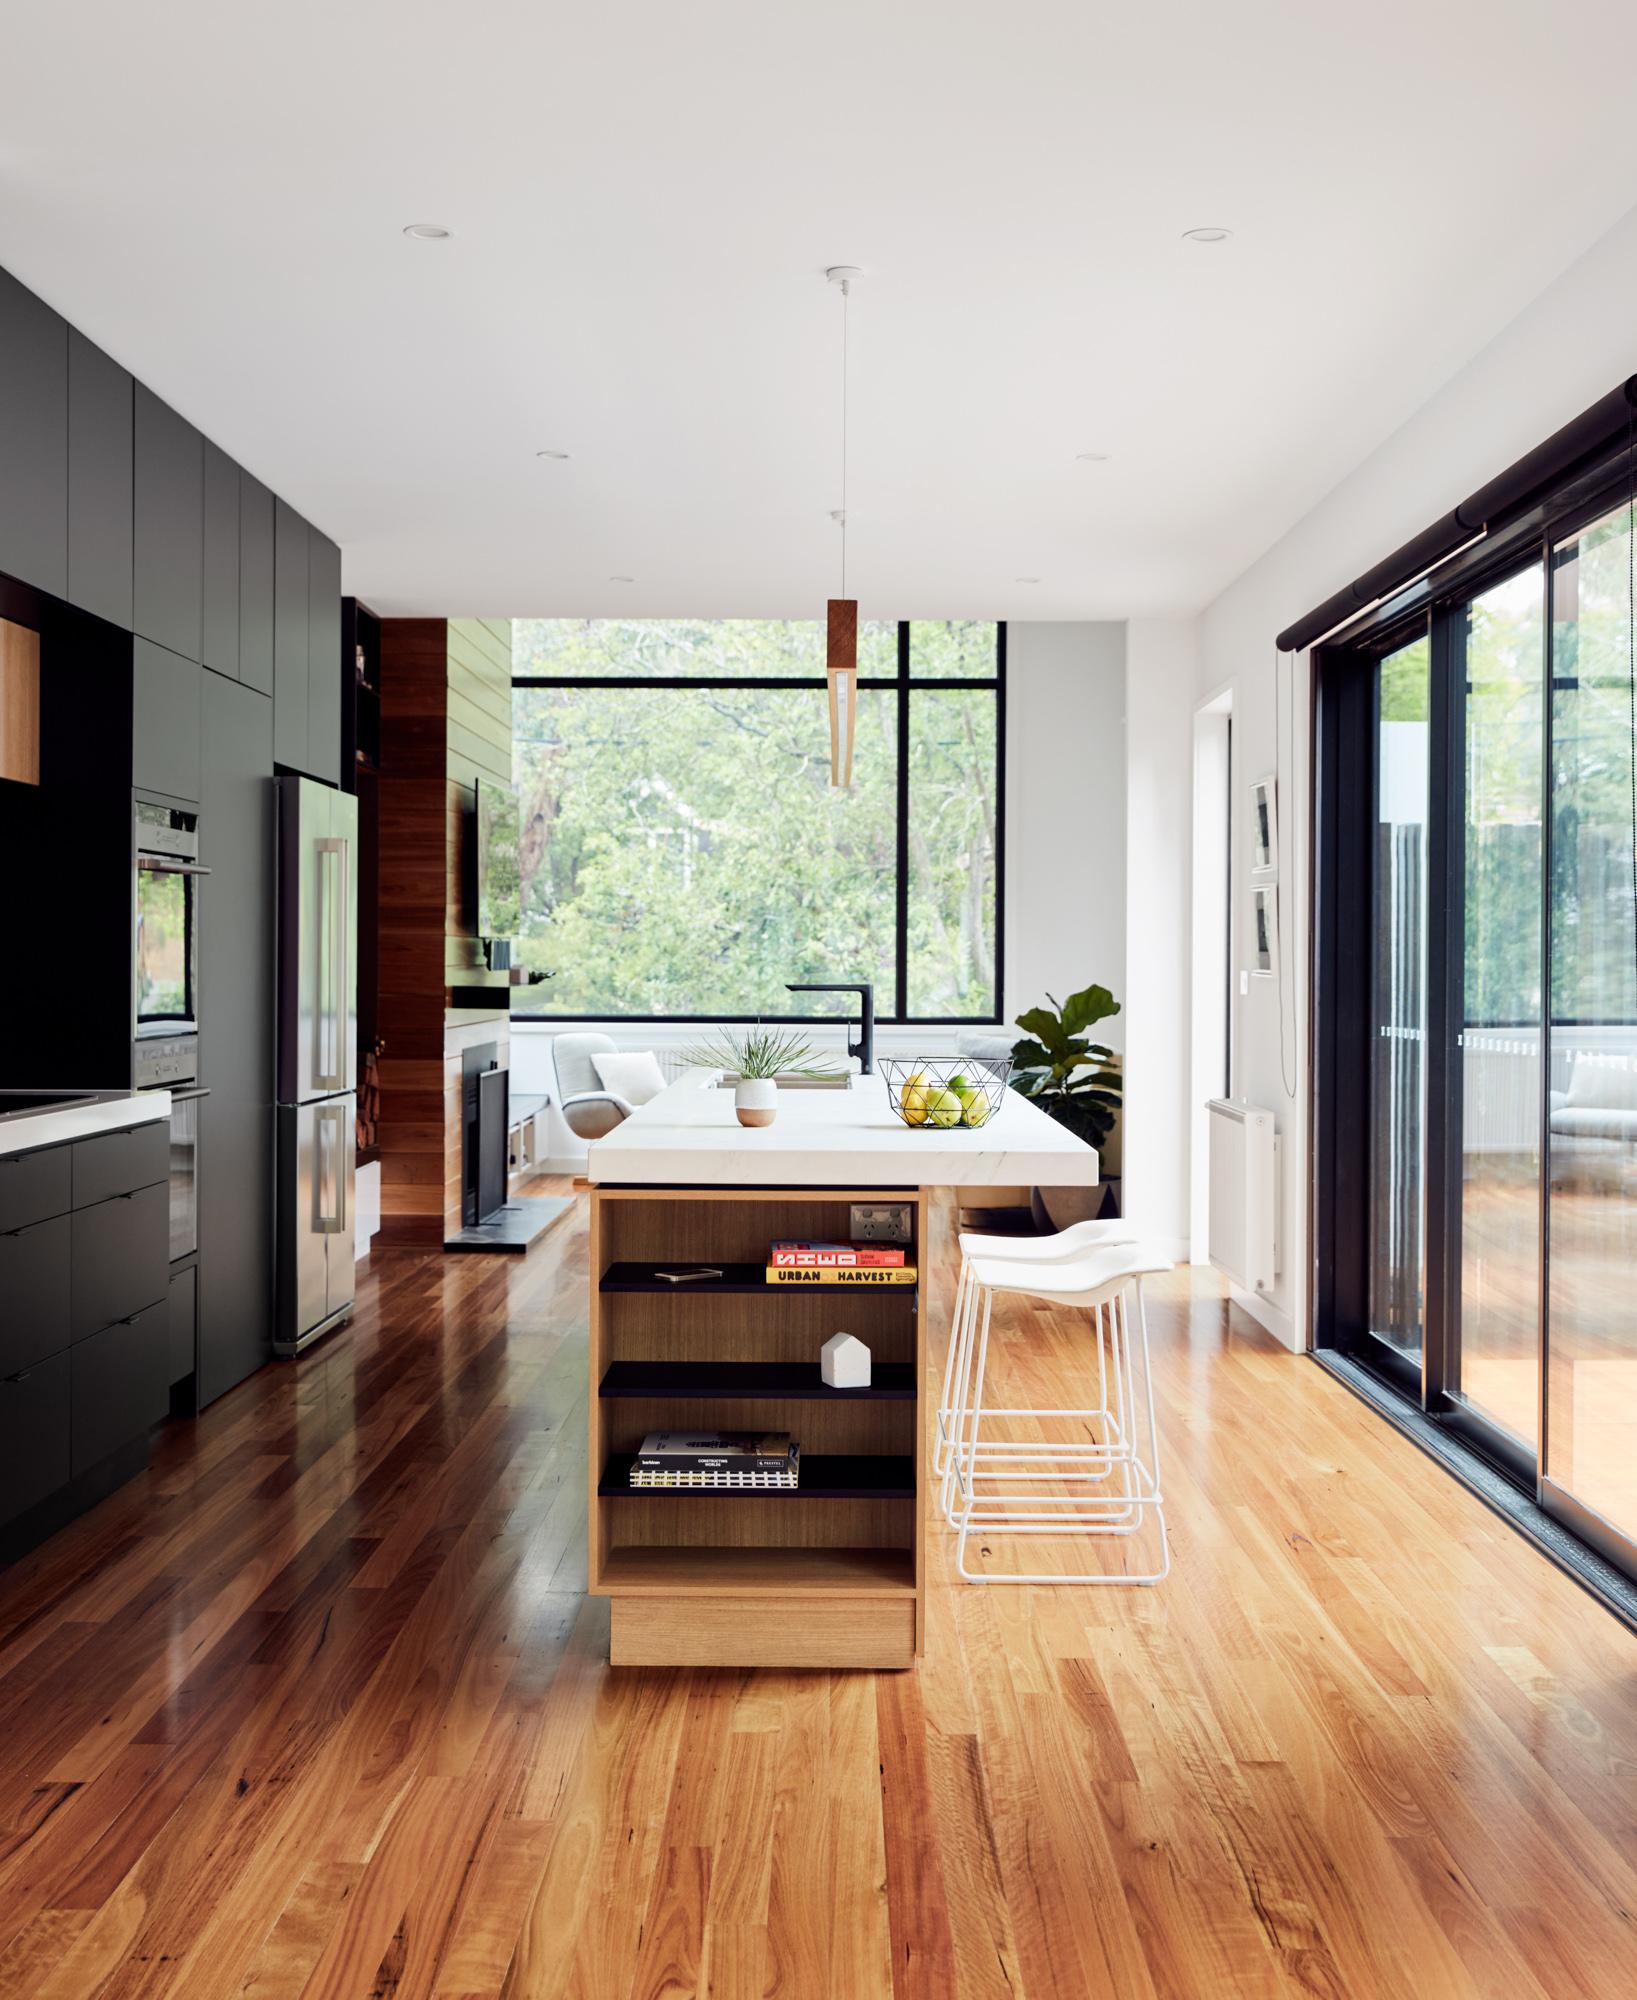 Gallery Of Blackburn House By Archiblox Local Australian Architecture & Design Blackburn, Vic Image 3